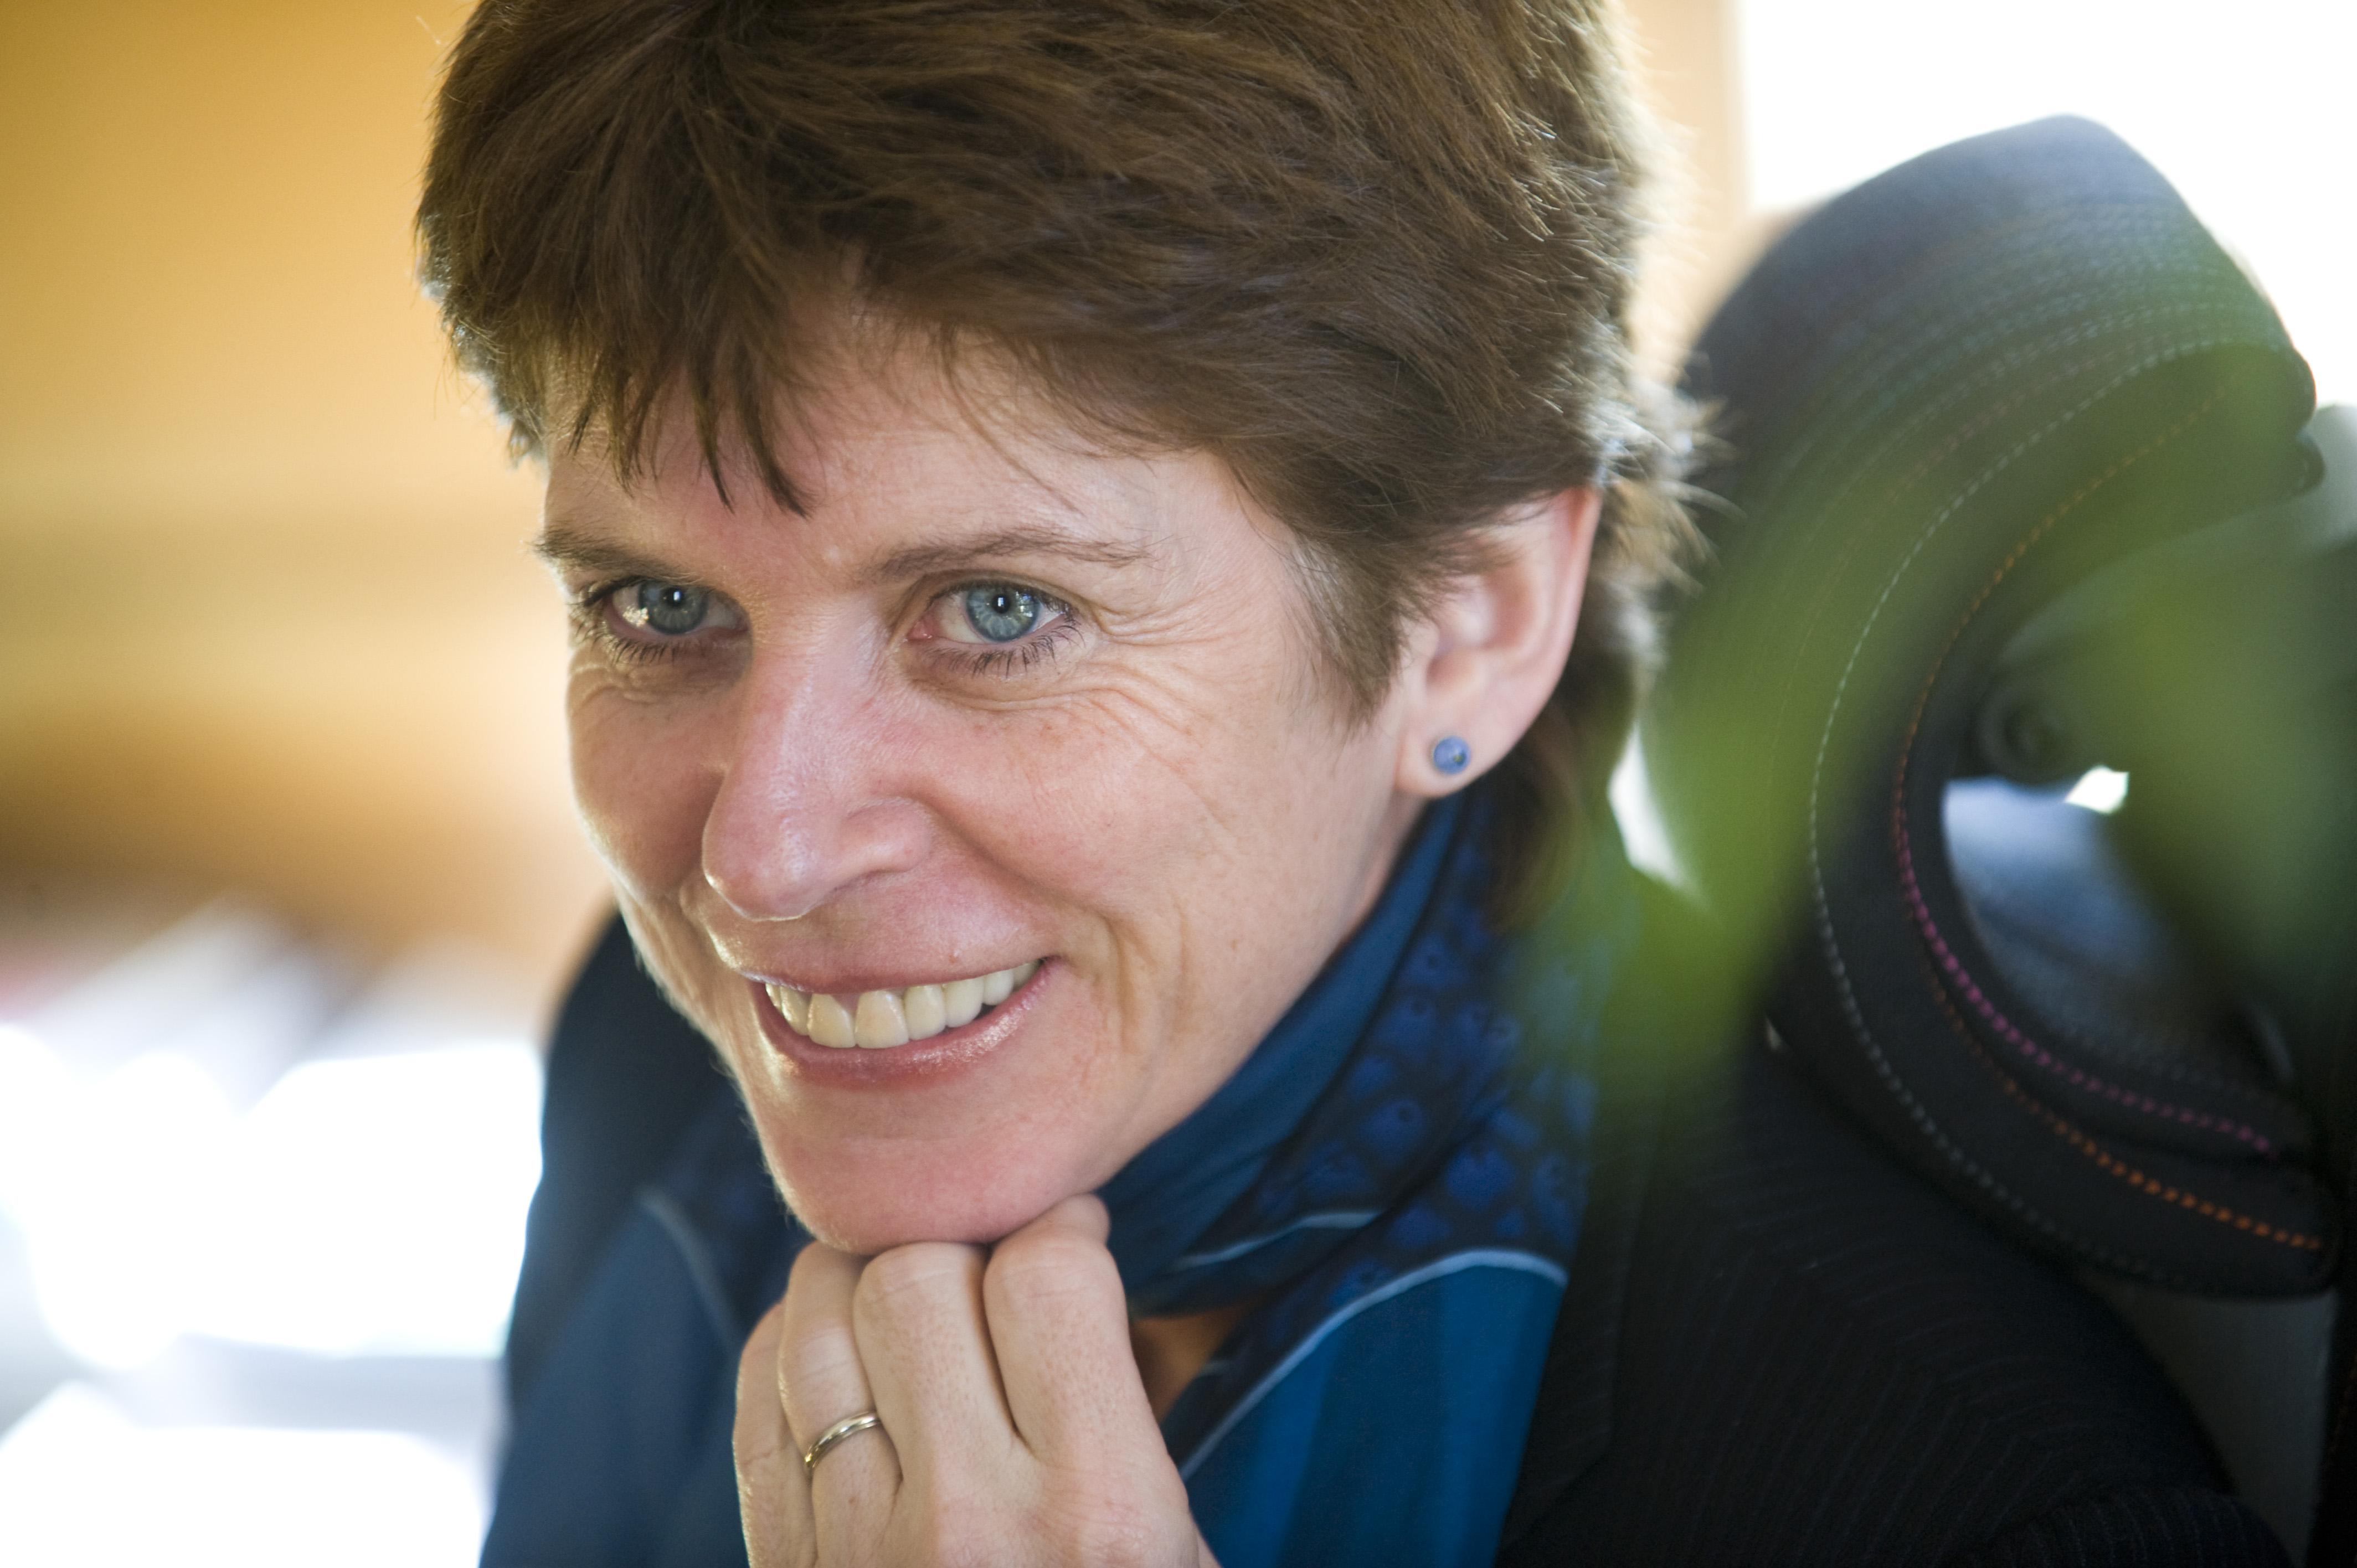 SOCIETAS [ソキエタス]オックスフォード大学史上初の女性総長が誕生コメント